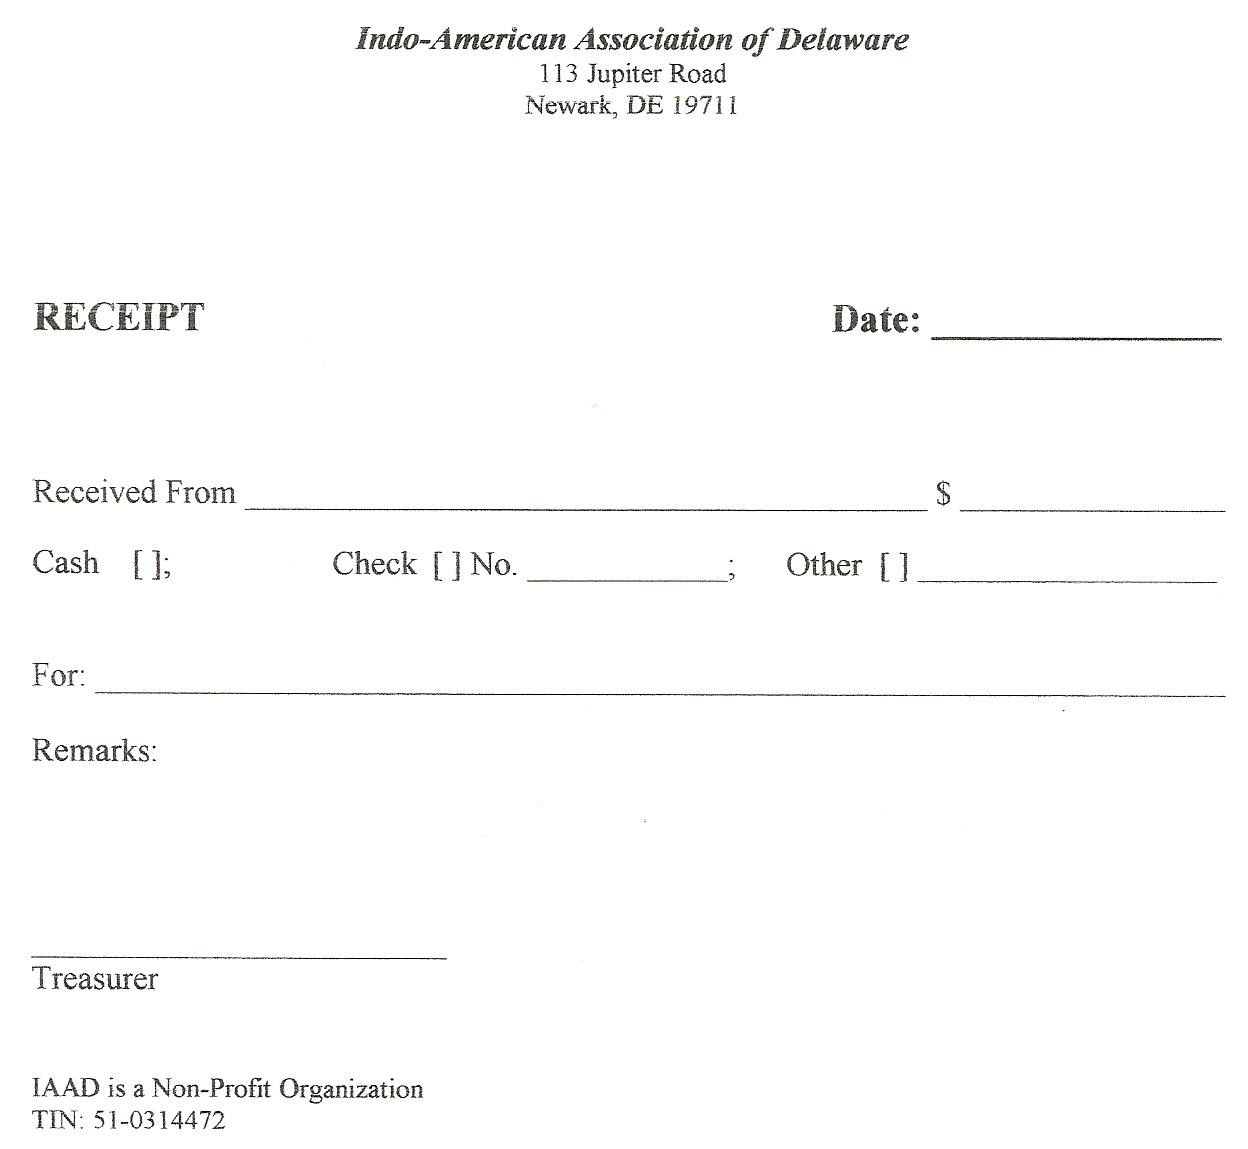 Receipt Forms funeral templates, printable award templates,